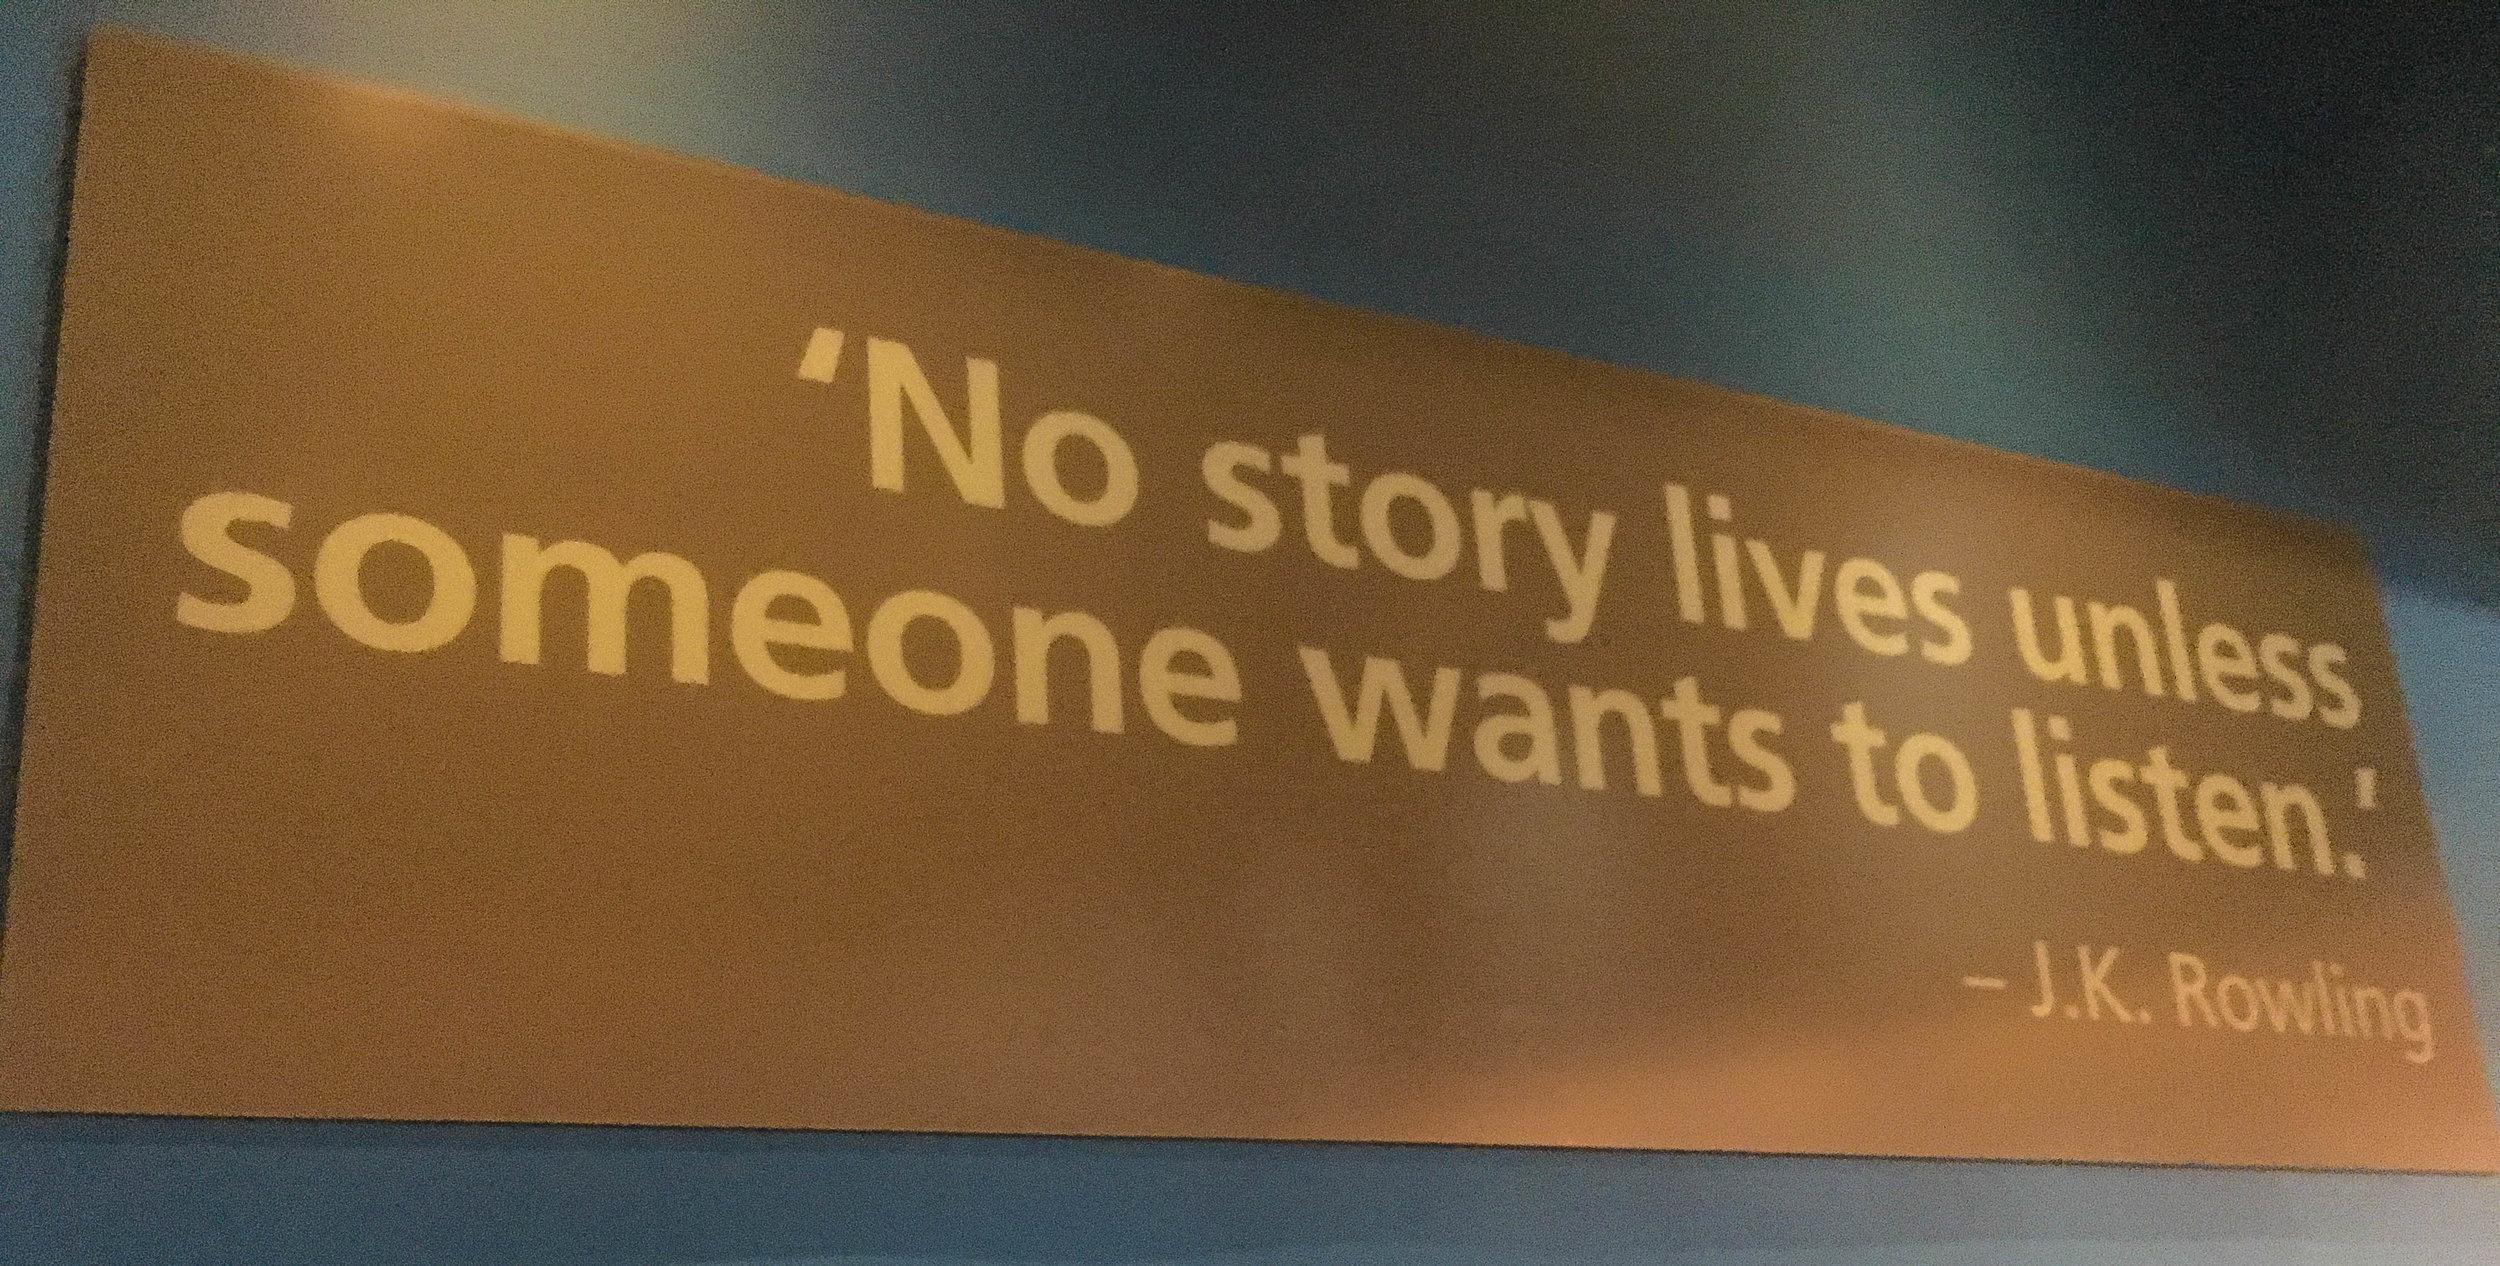 JK Rowling Quote.jpg